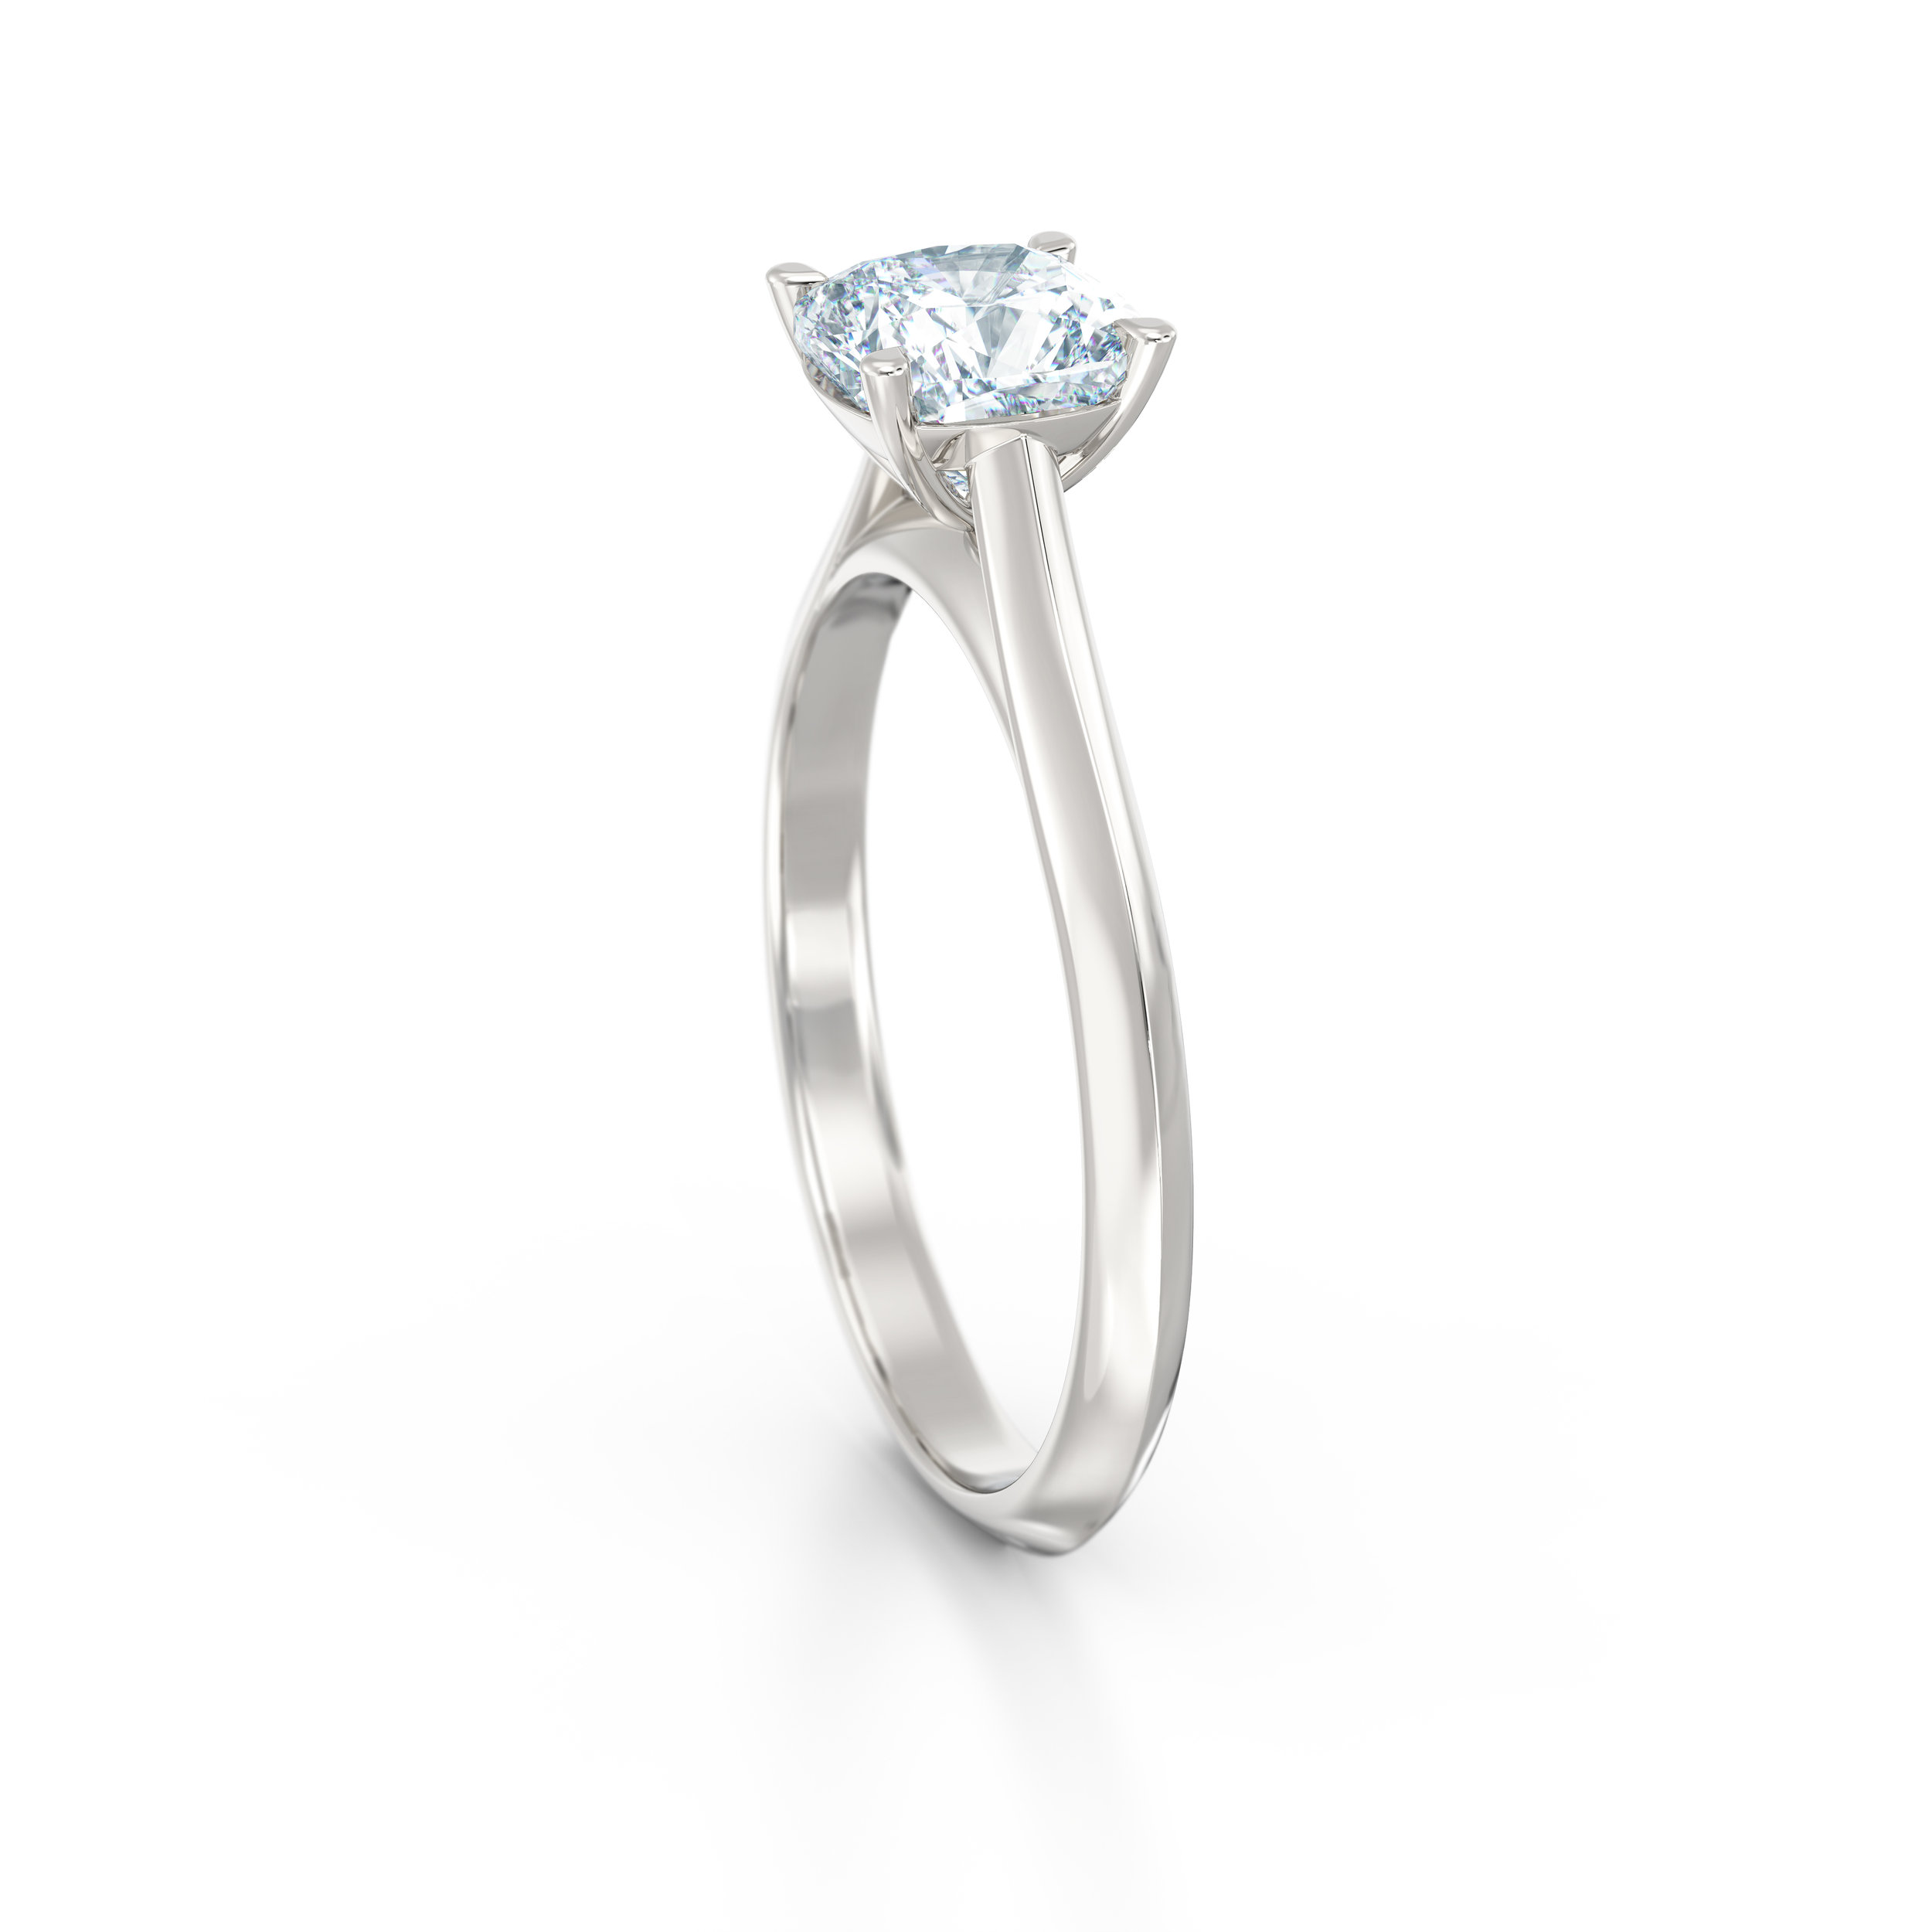 Cushion Cut Solitaire Engagement Ring | Hatton Garden